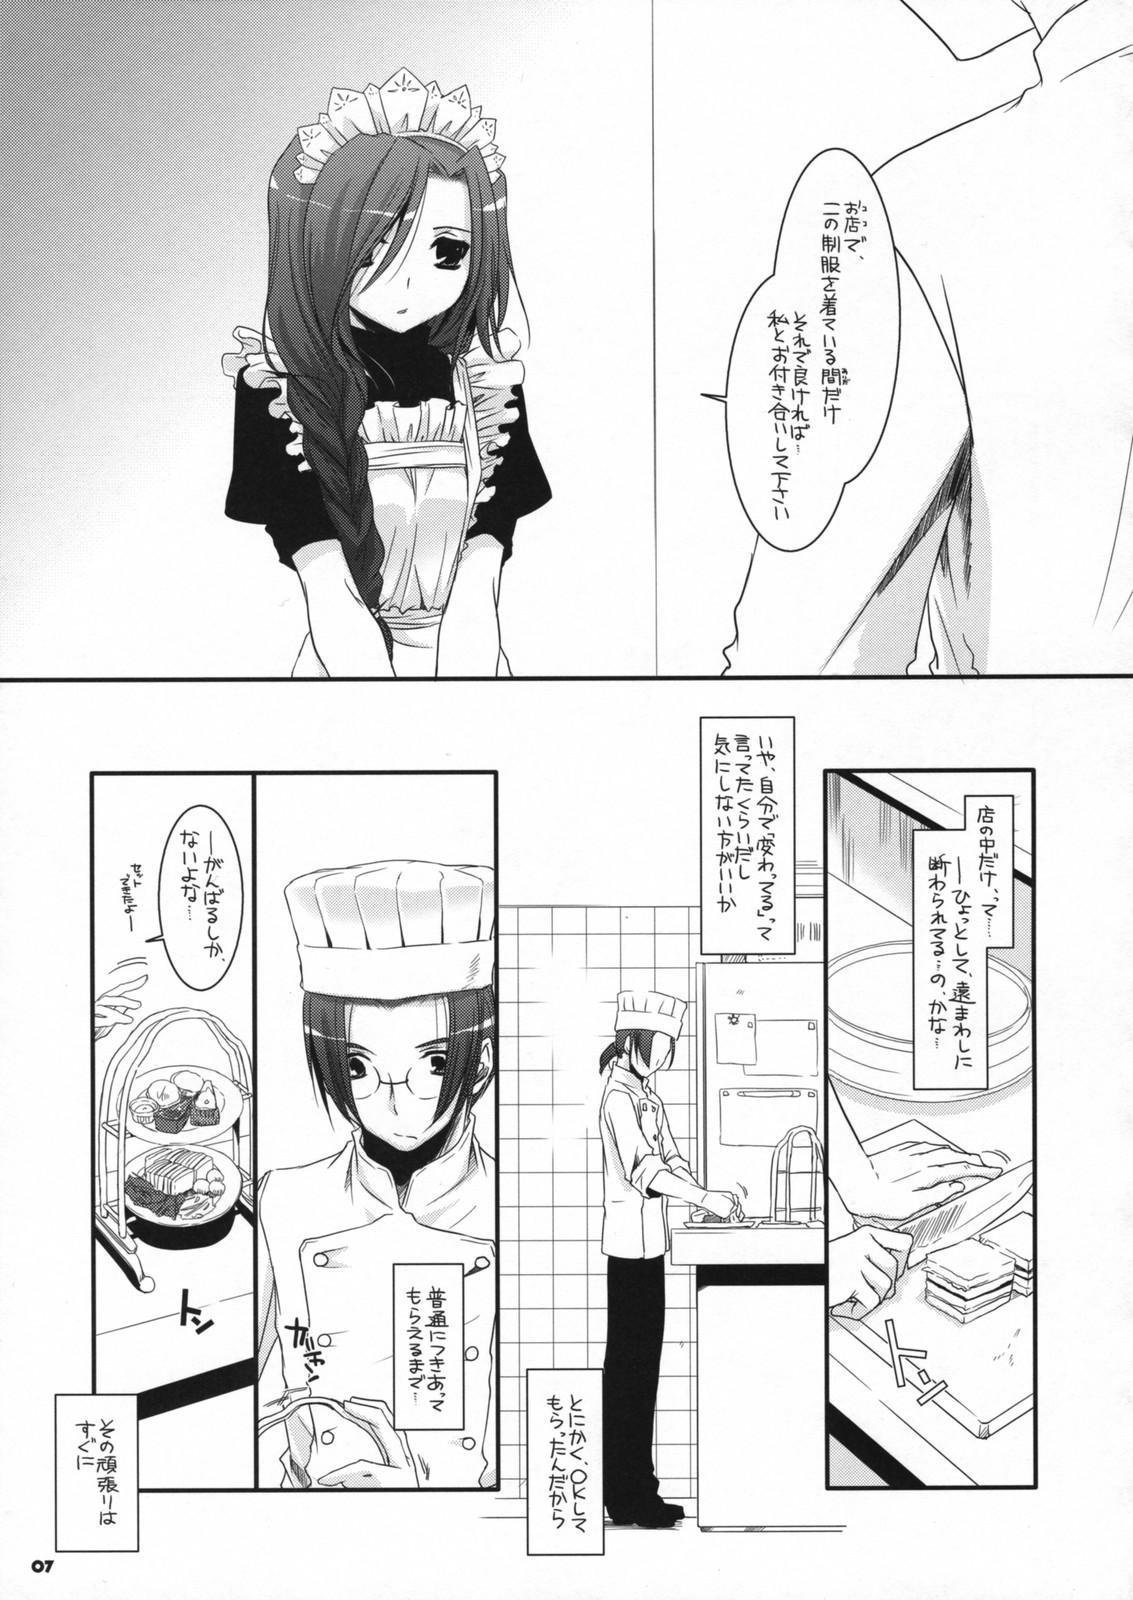 Seifuku Rakuen 21 - Costume Paradise 21 5